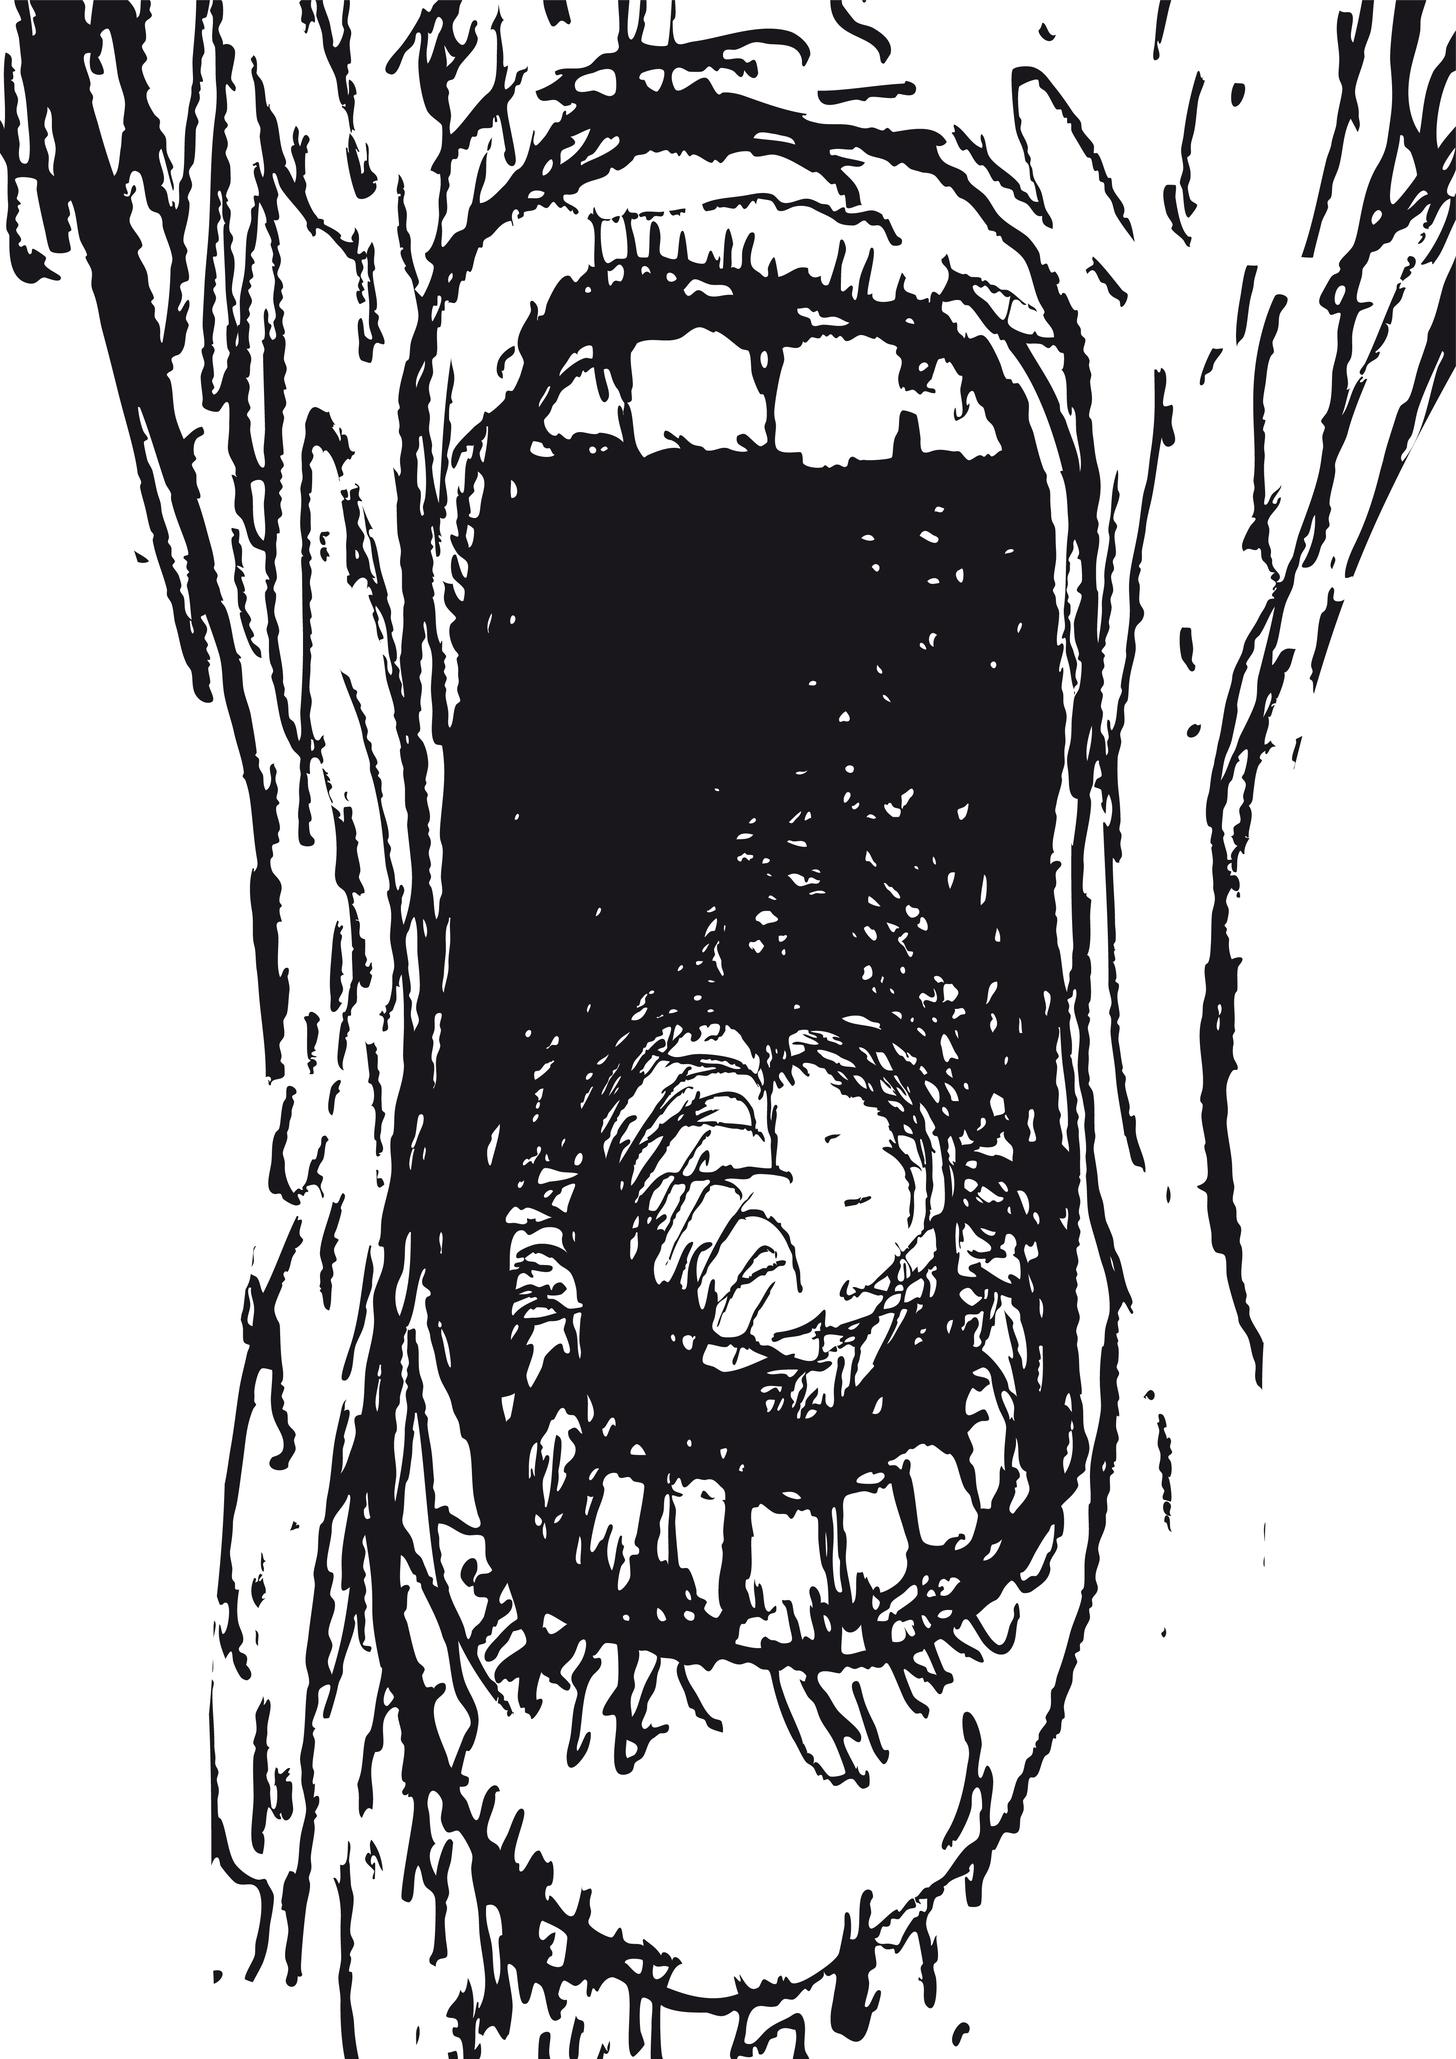 Le cri de la peur